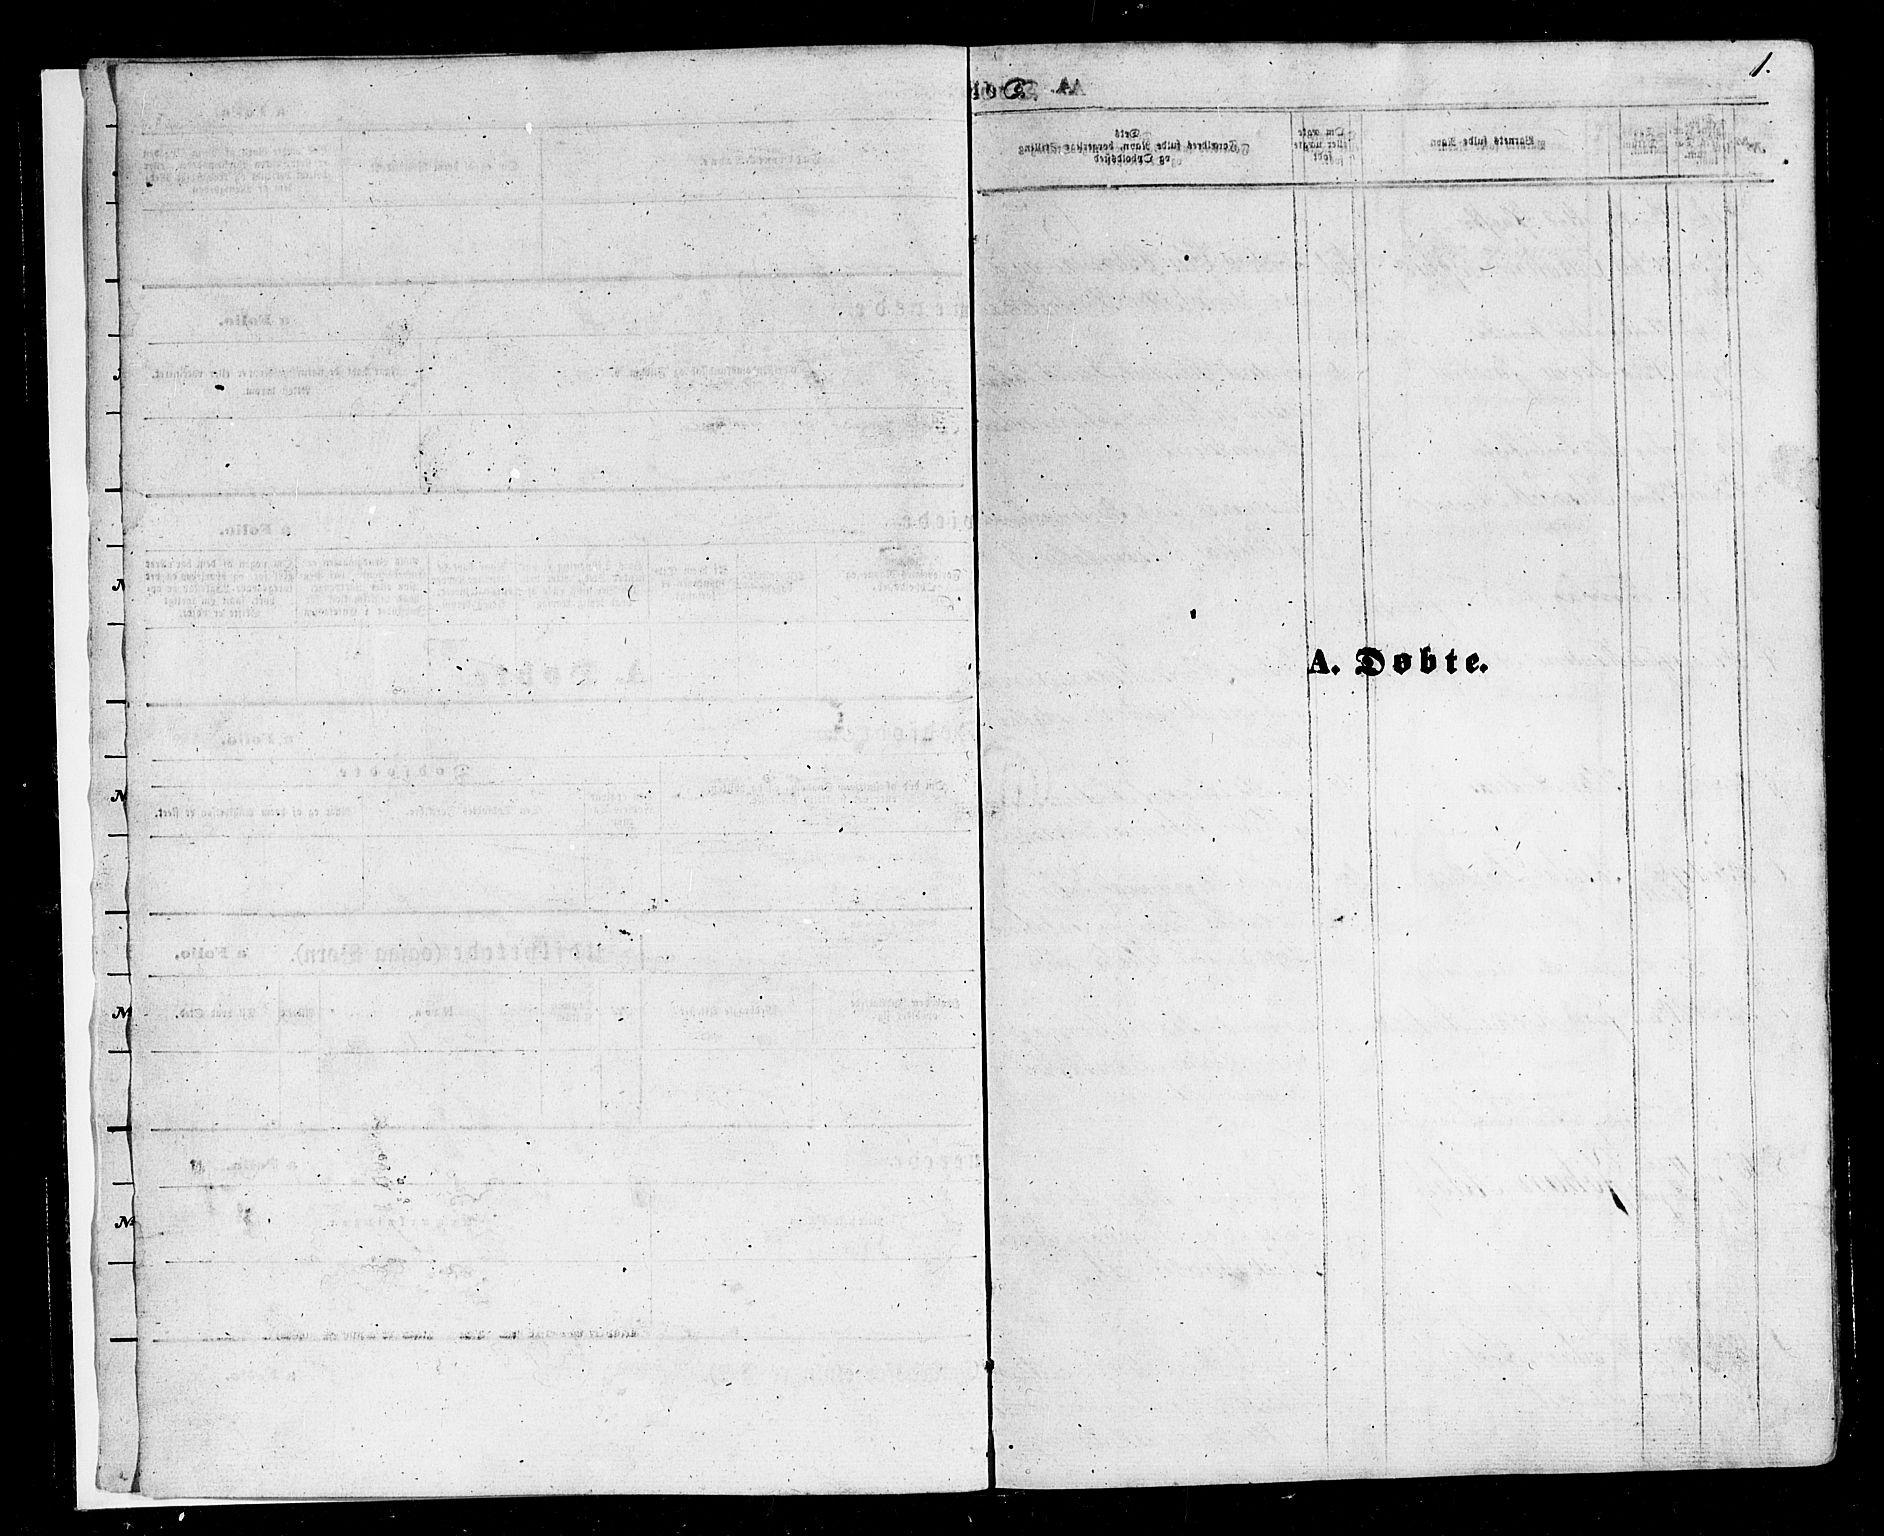 SAT, Ministerialprotokoller, klokkerbøker og fødselsregistre - Nordland, 803/L0075: Klokkerbok nr. 803C02, 1867-1881, s. 1